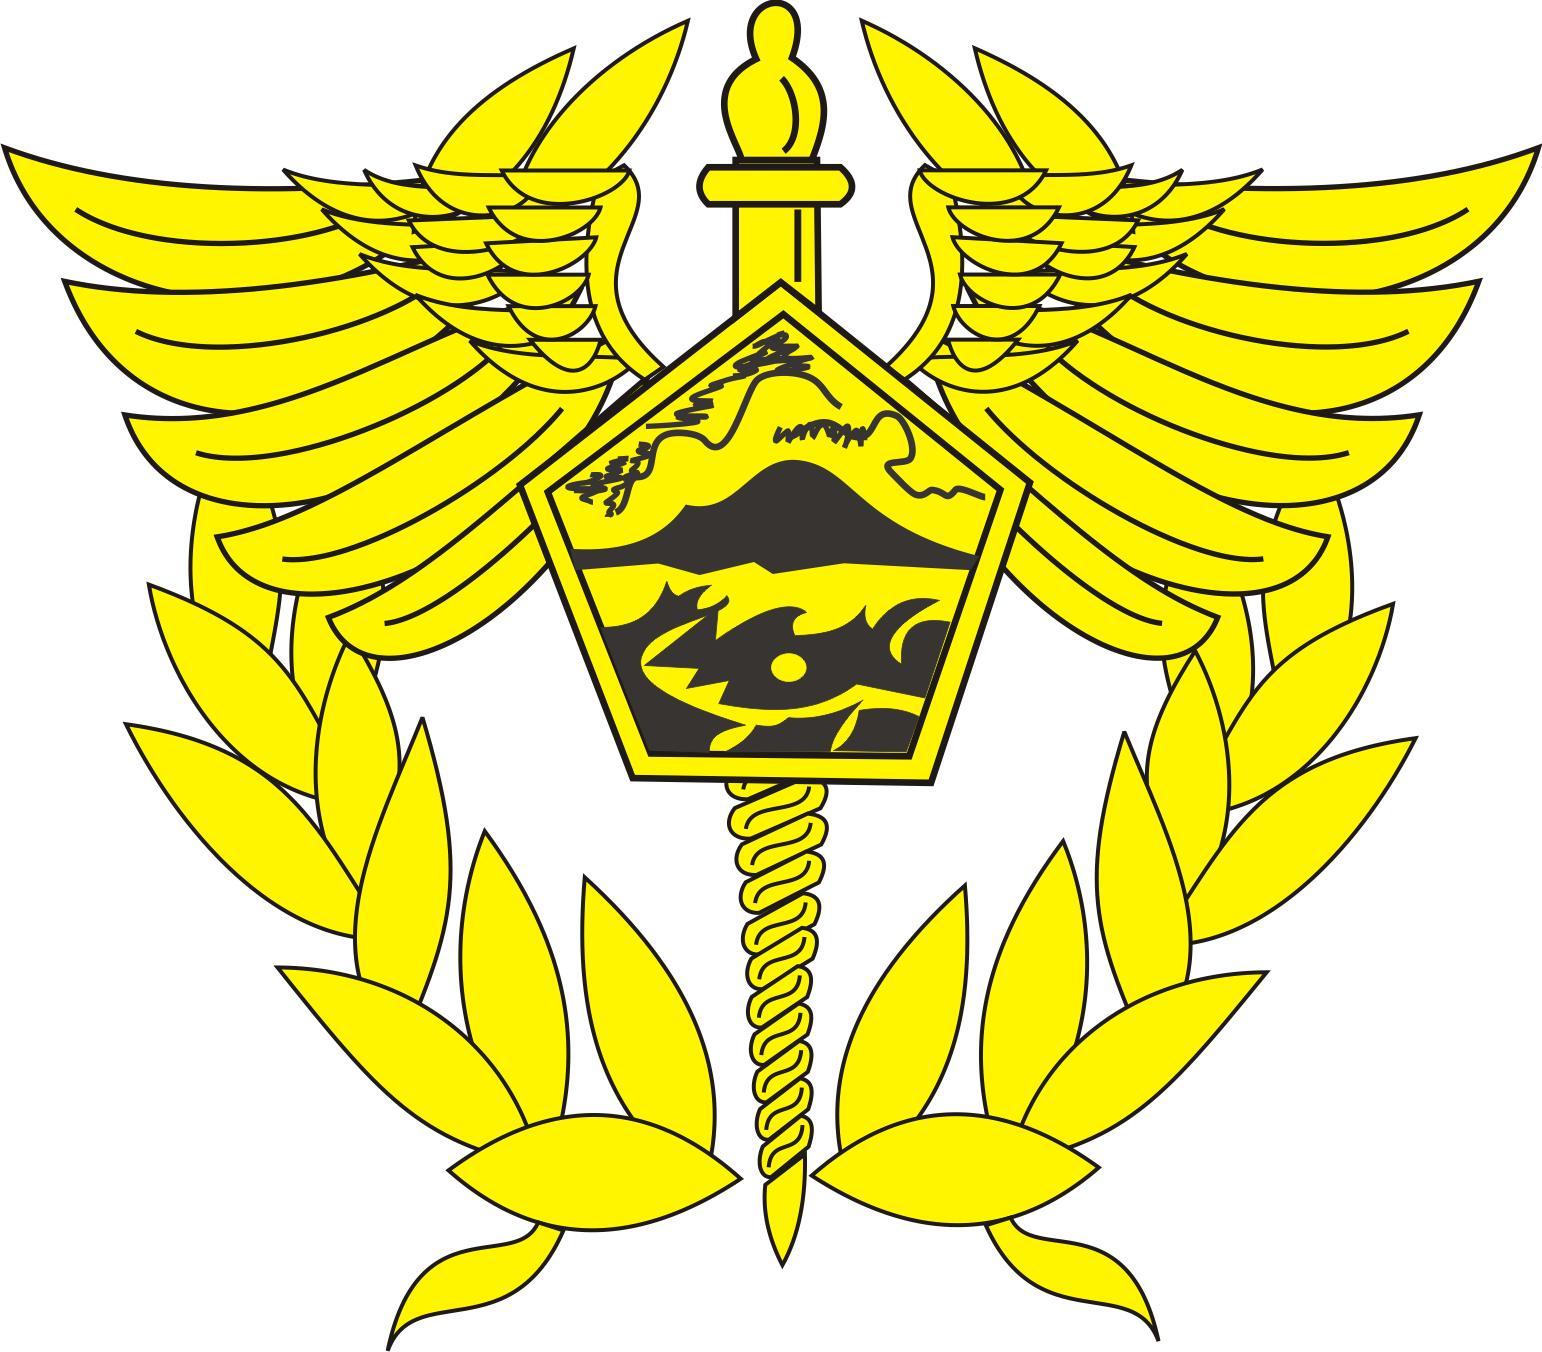 Logo Bea Cukai, Jasa Raharja dan Logo Bina Sarana